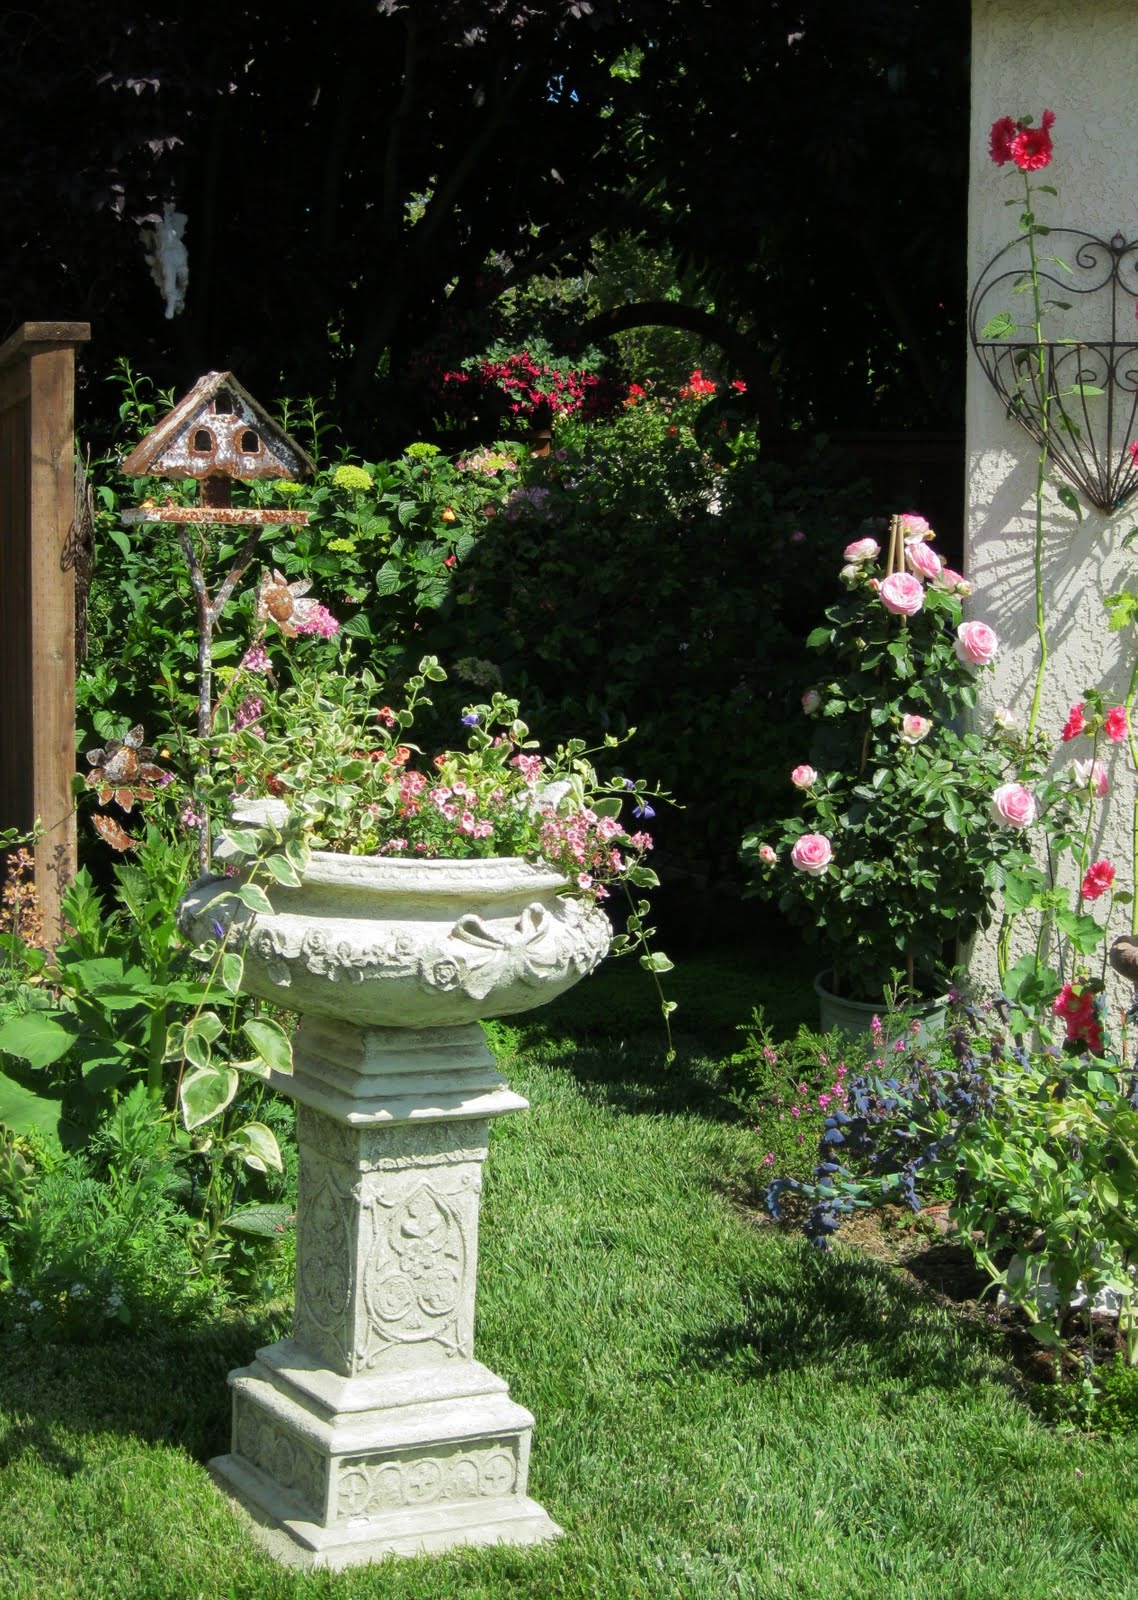 C b i d home decor and design gardening cottage garden shabby chic - Garden furniture shabby chic ...